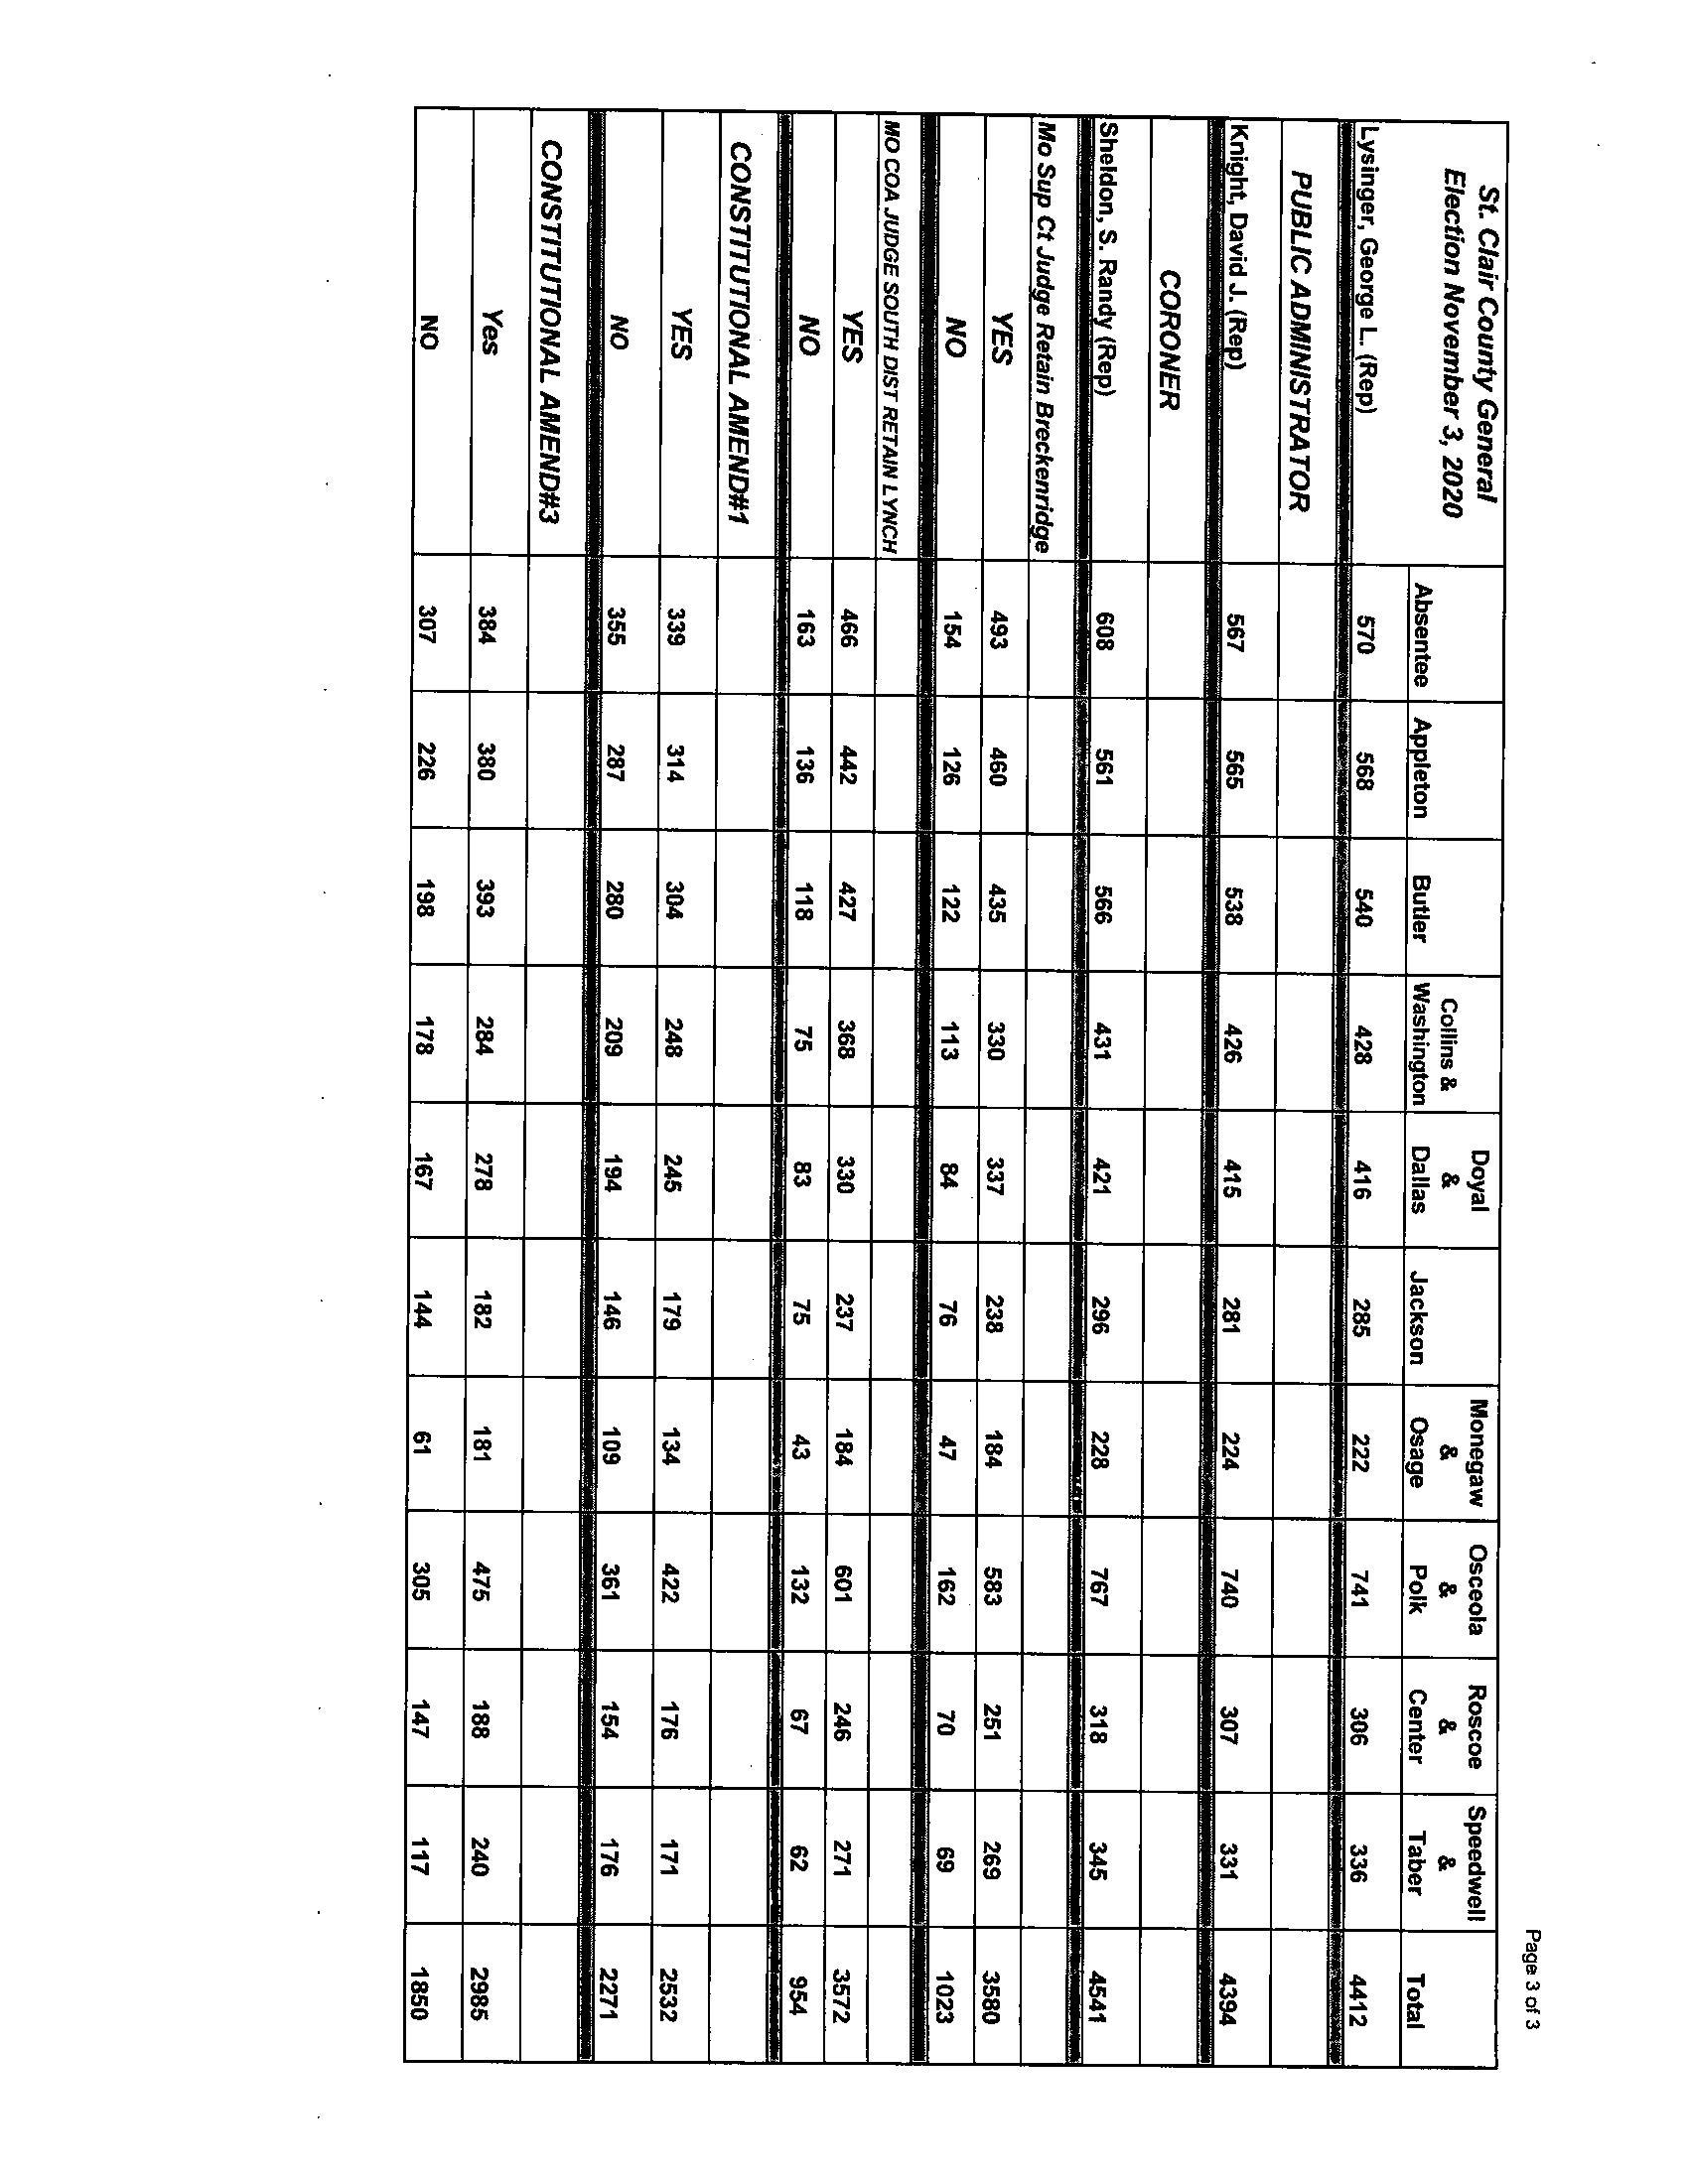 November 3, 2020 Election Results | St. Clair County Missouri November 2021 Election Calendar